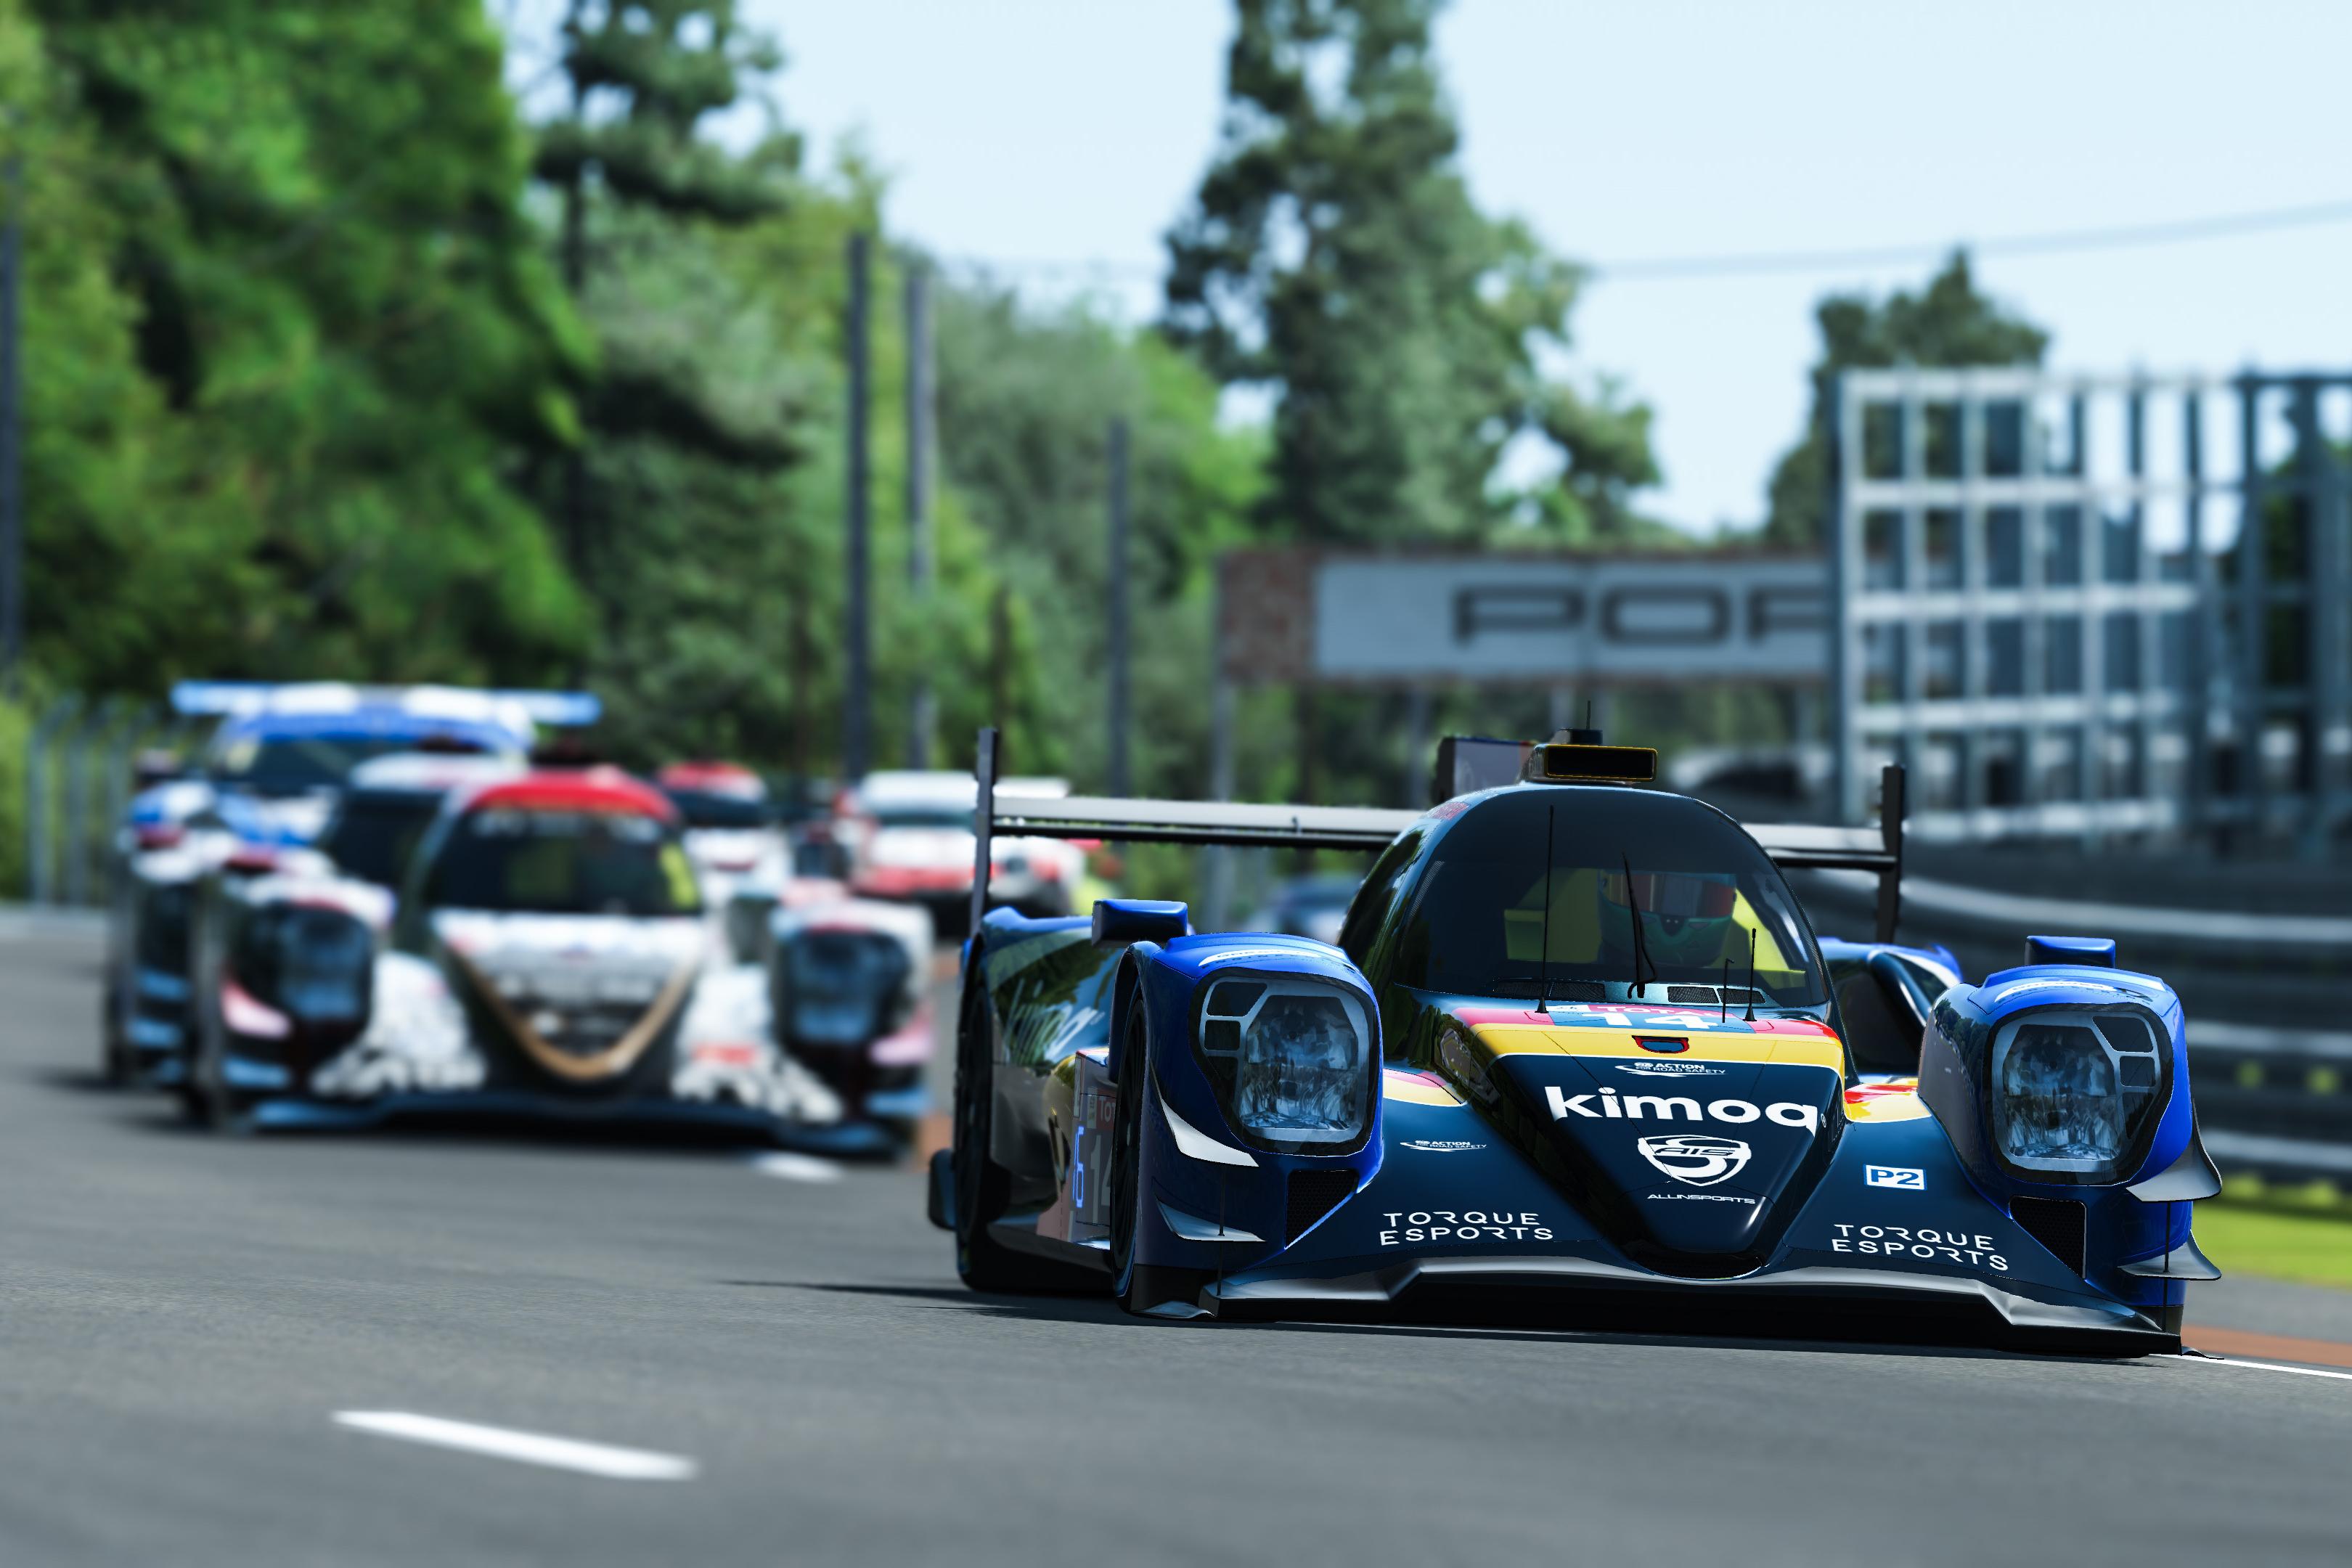 FA/RB Allinsports Alonso Barrichello virtual Le Mans